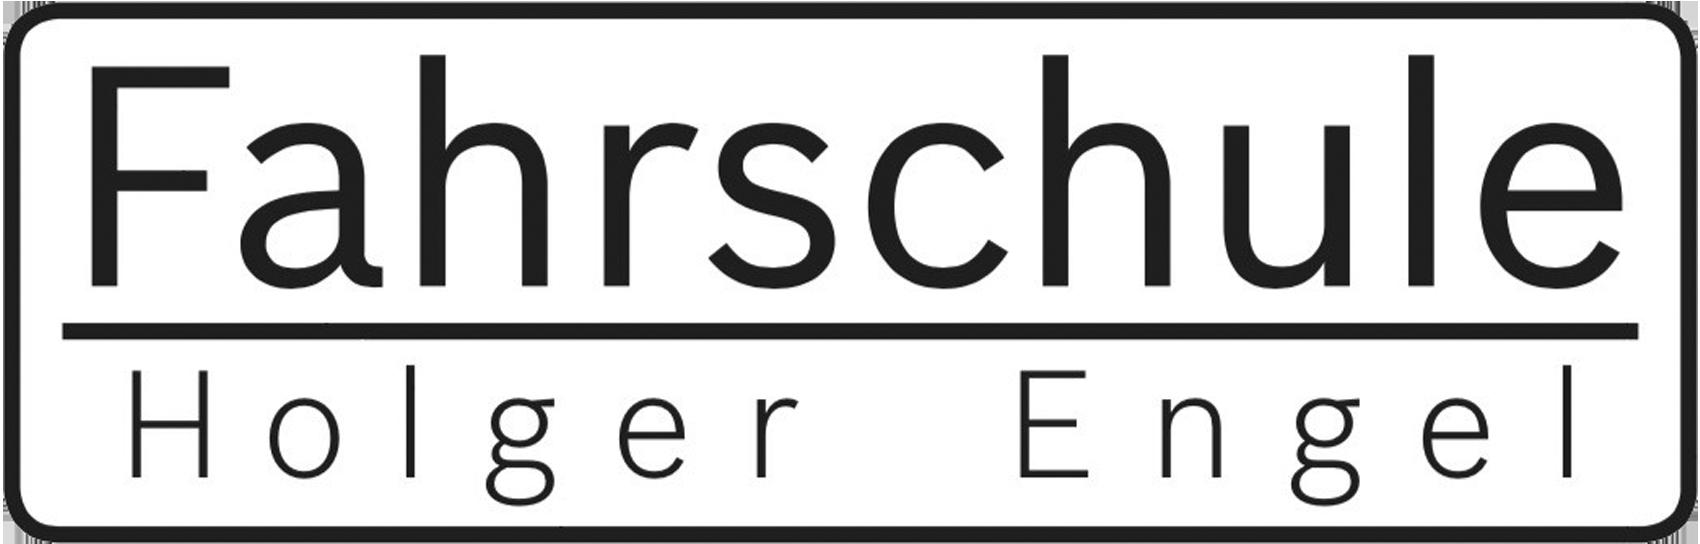 Fahrschule Holger Engel - Home